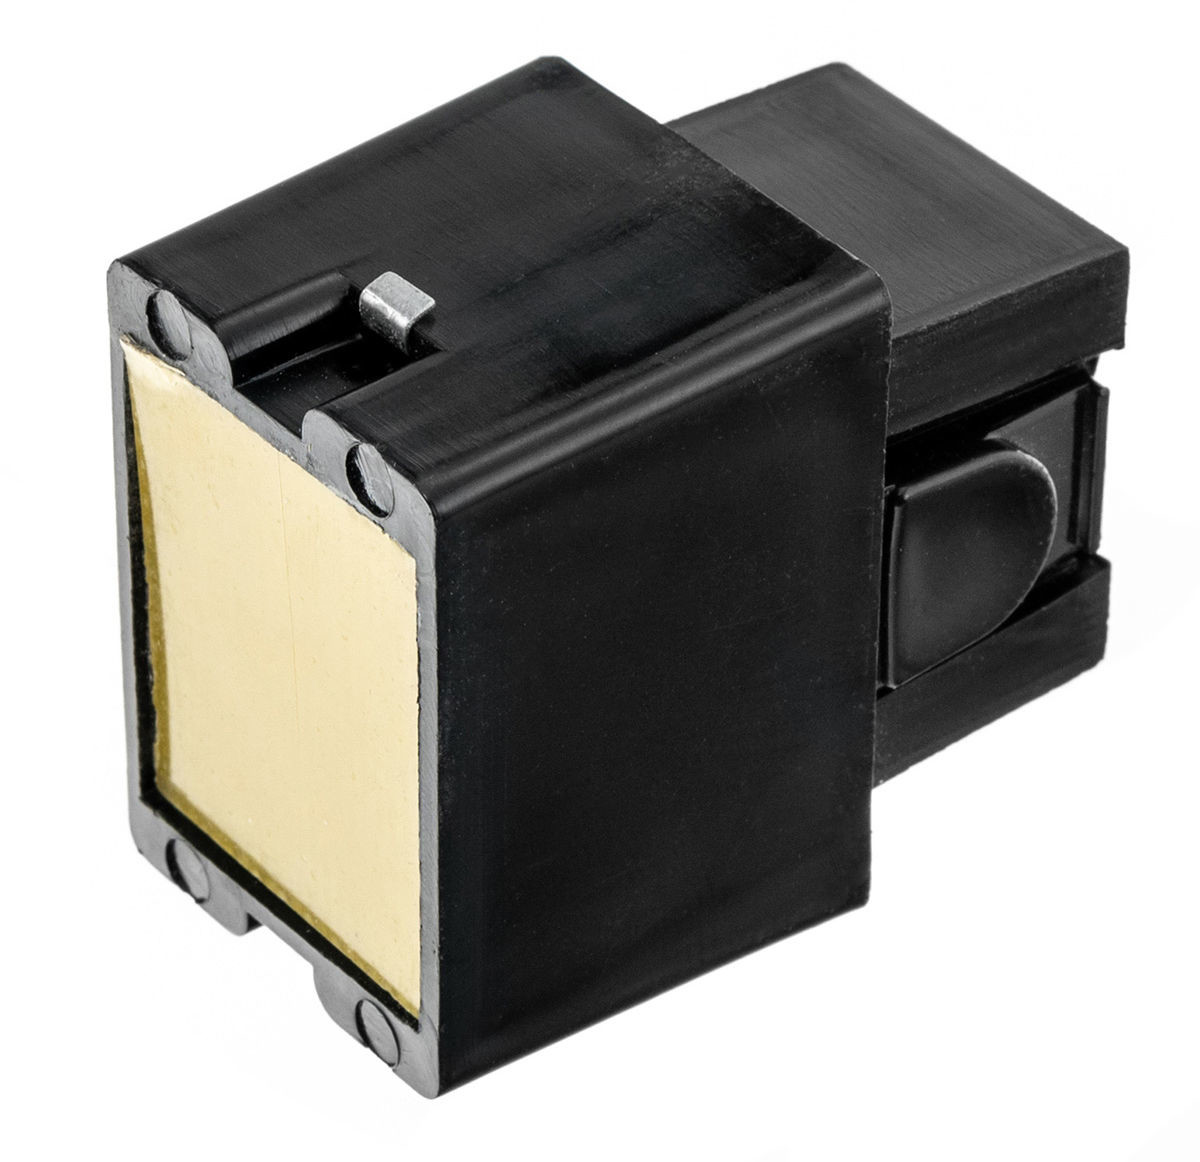 Kartridż z elektrodami do paralizatora Blackfire Blaster (BF-SG4CD) BF-SG4CD